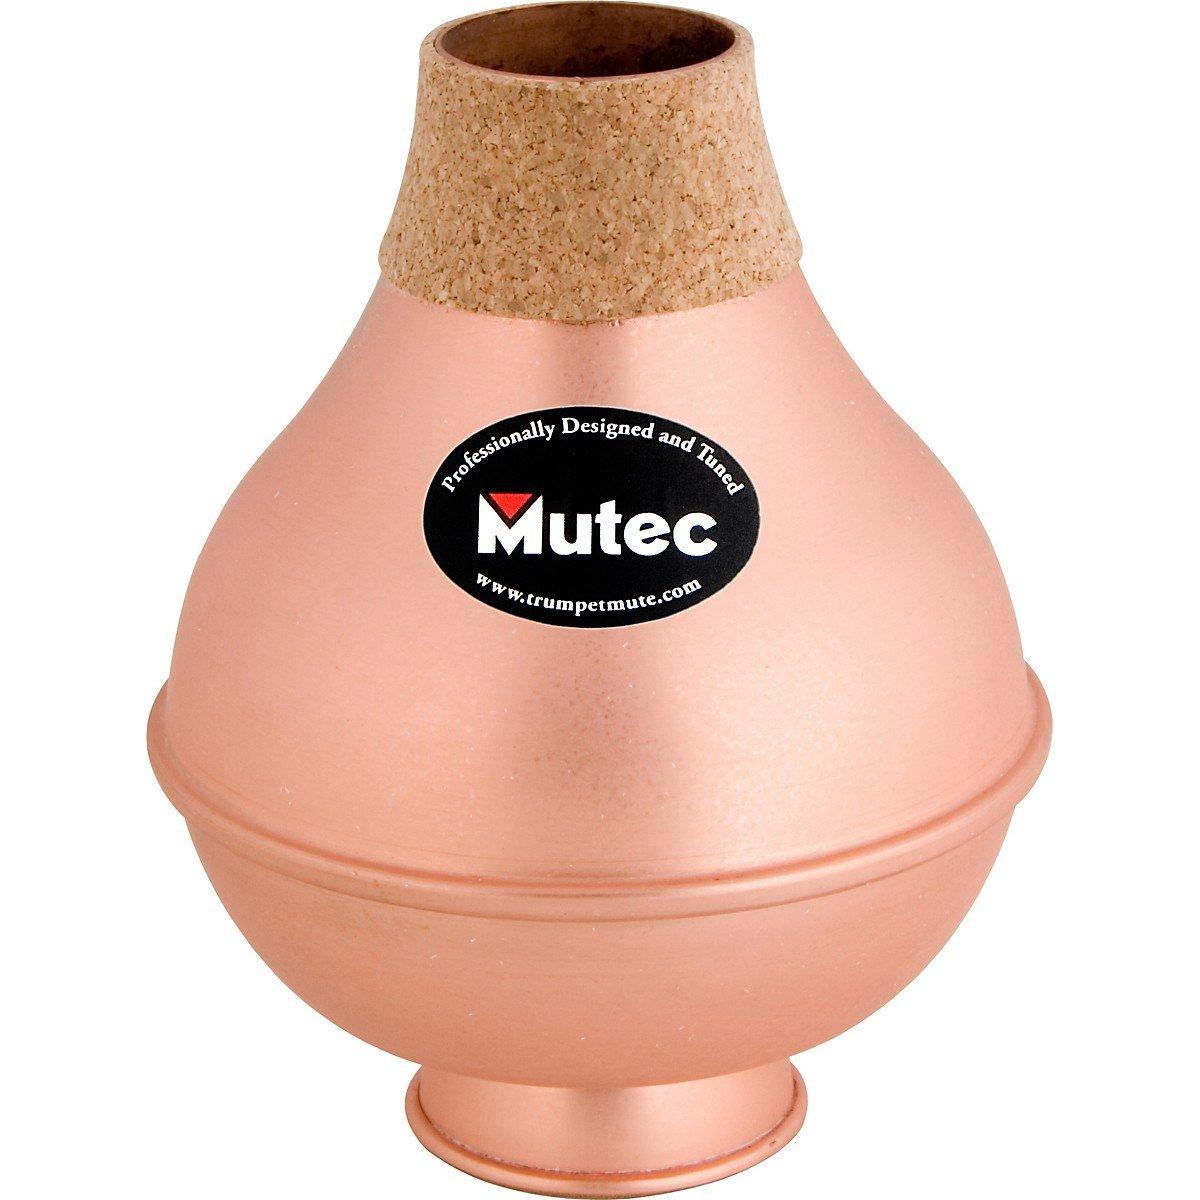 Mutec MHT131 Bubble Wah-Wah Mute for Trumpet - Copper